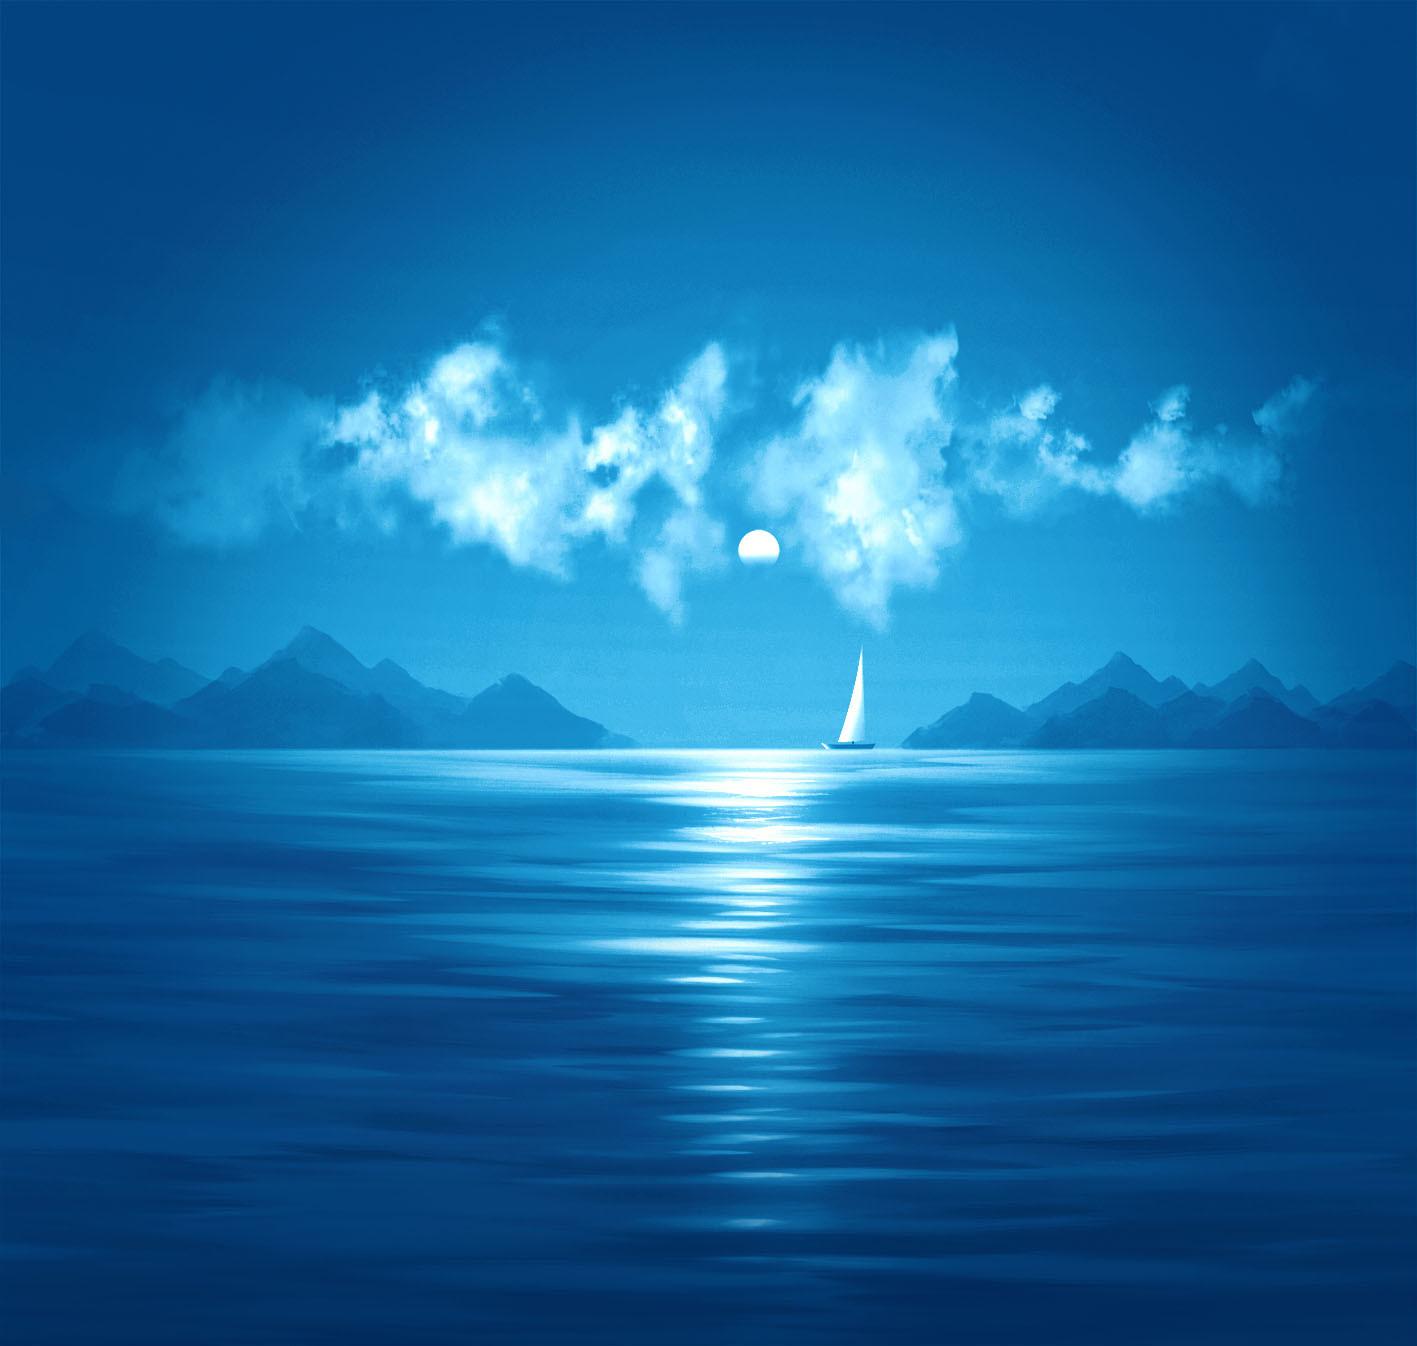 Emrullah cita moonlight